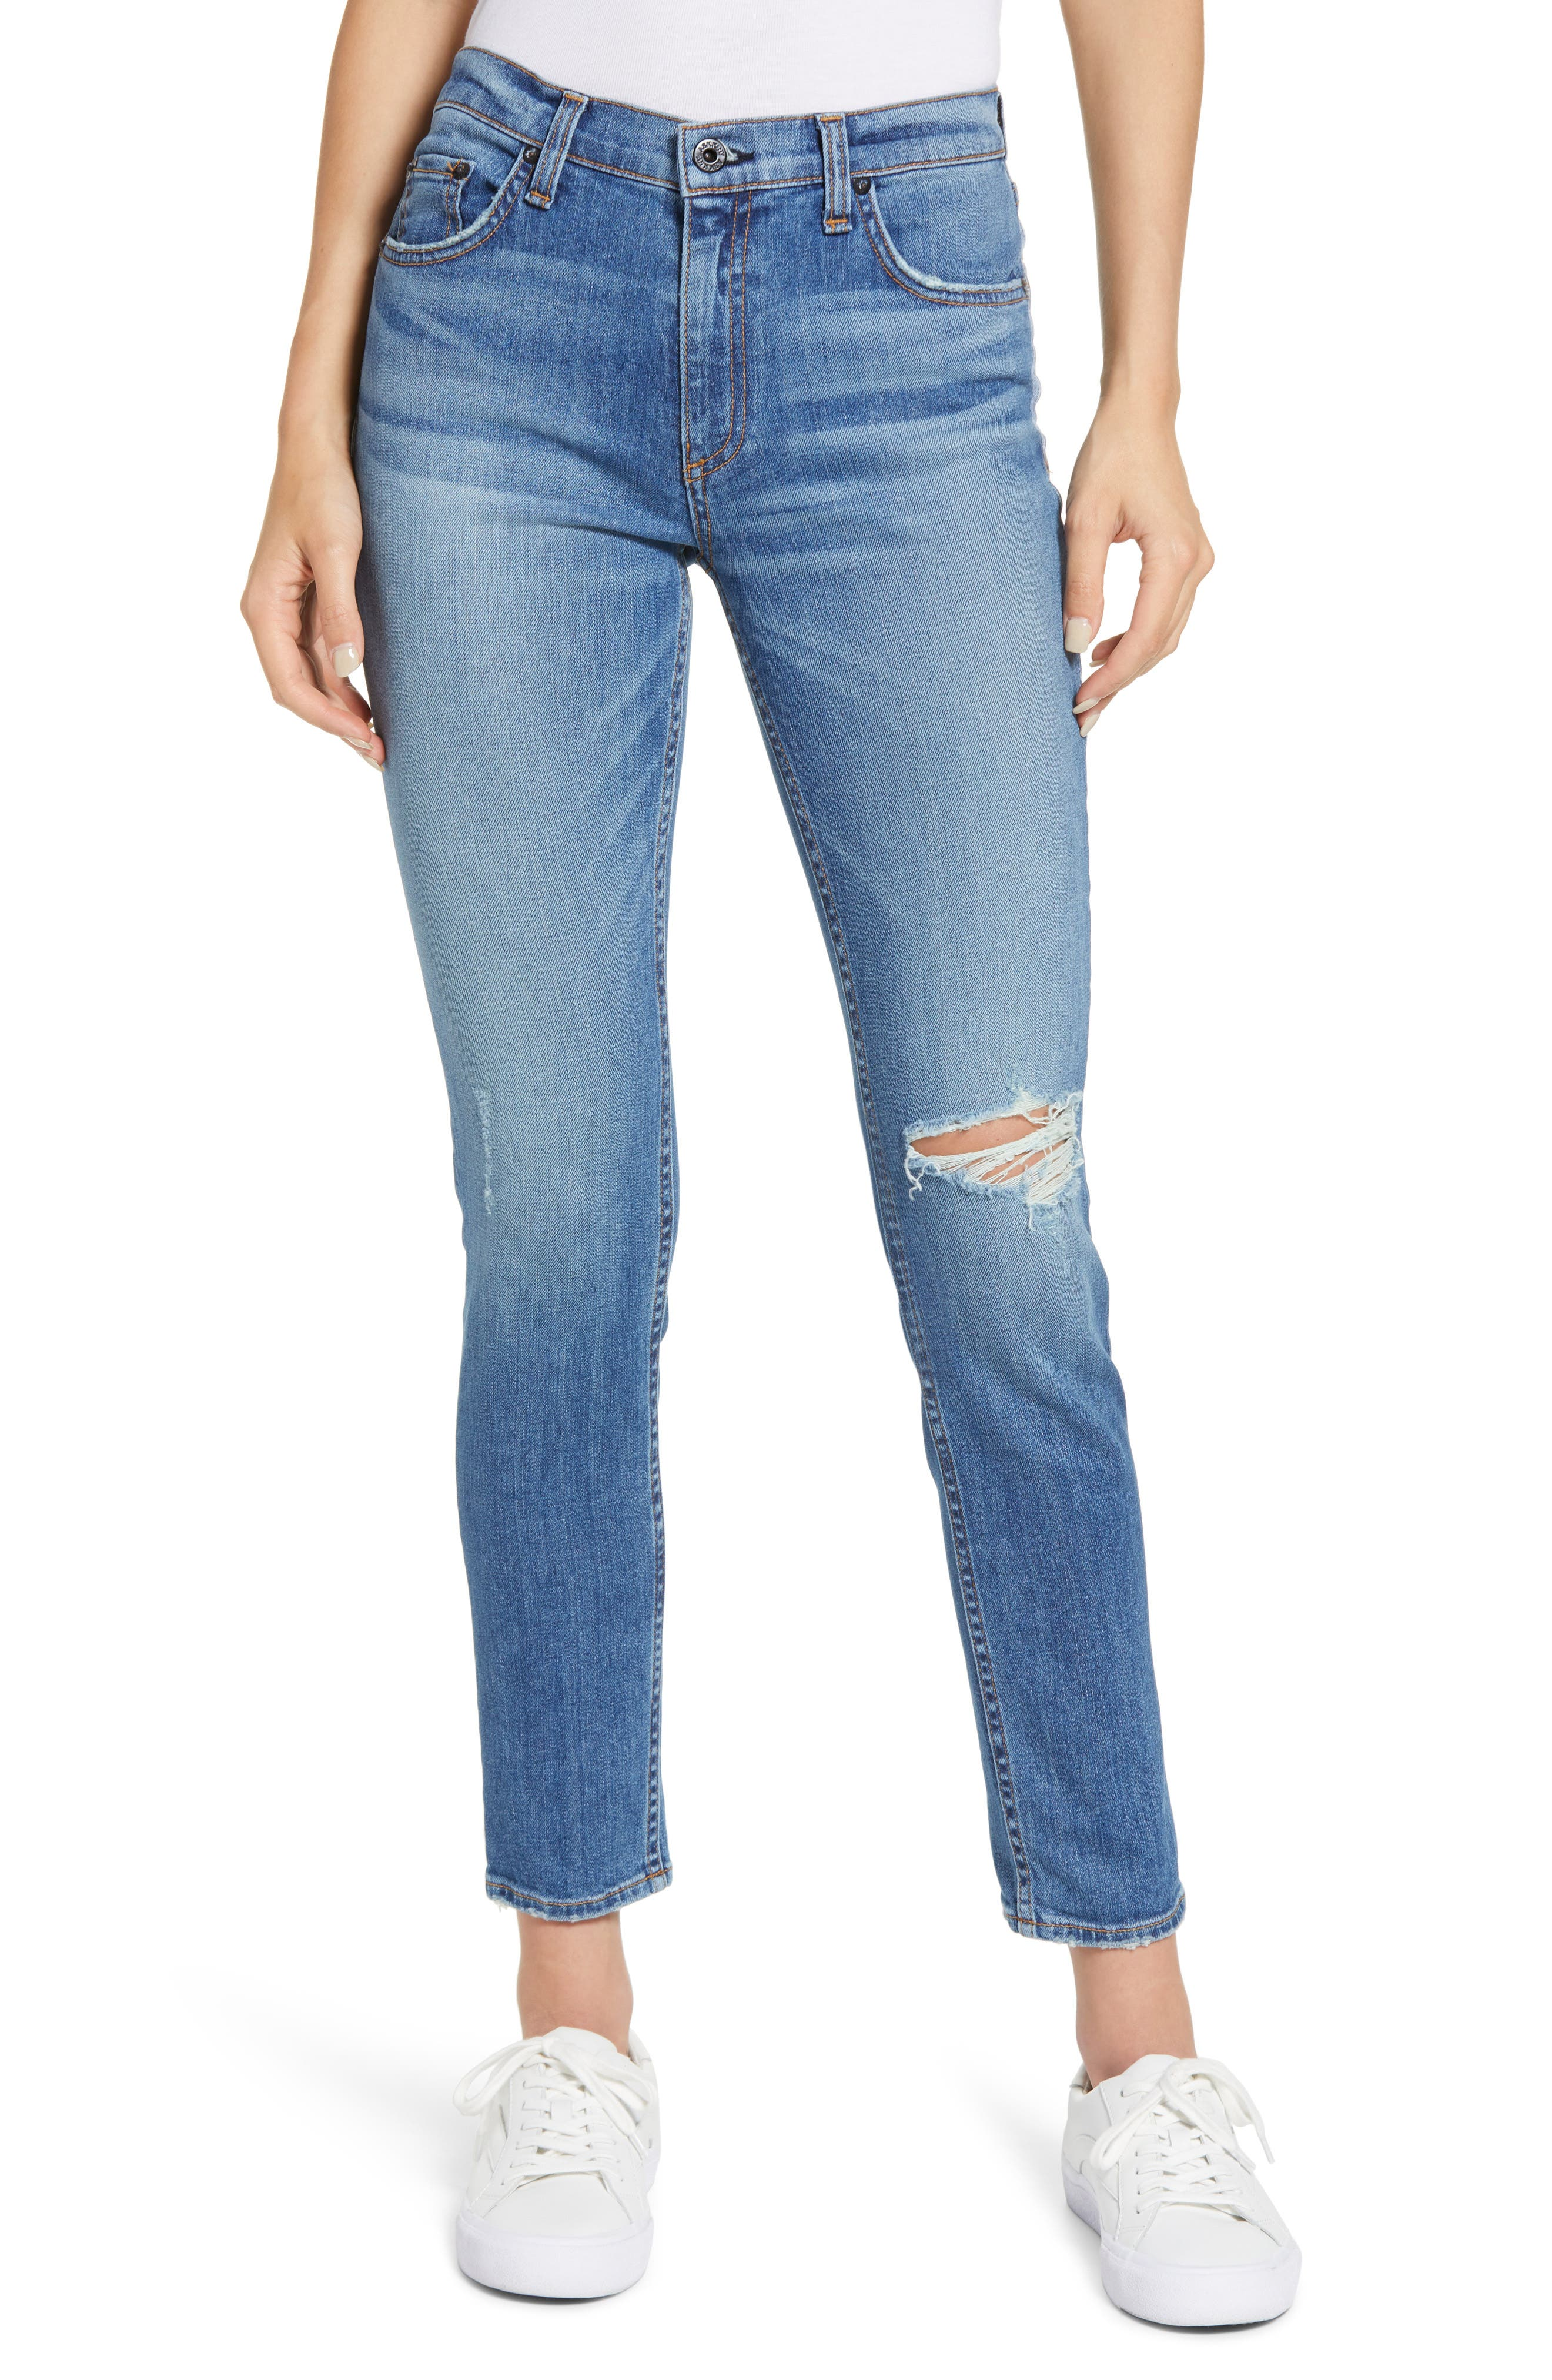 Jax Ripped High Waist Ankle Skinny Jeans